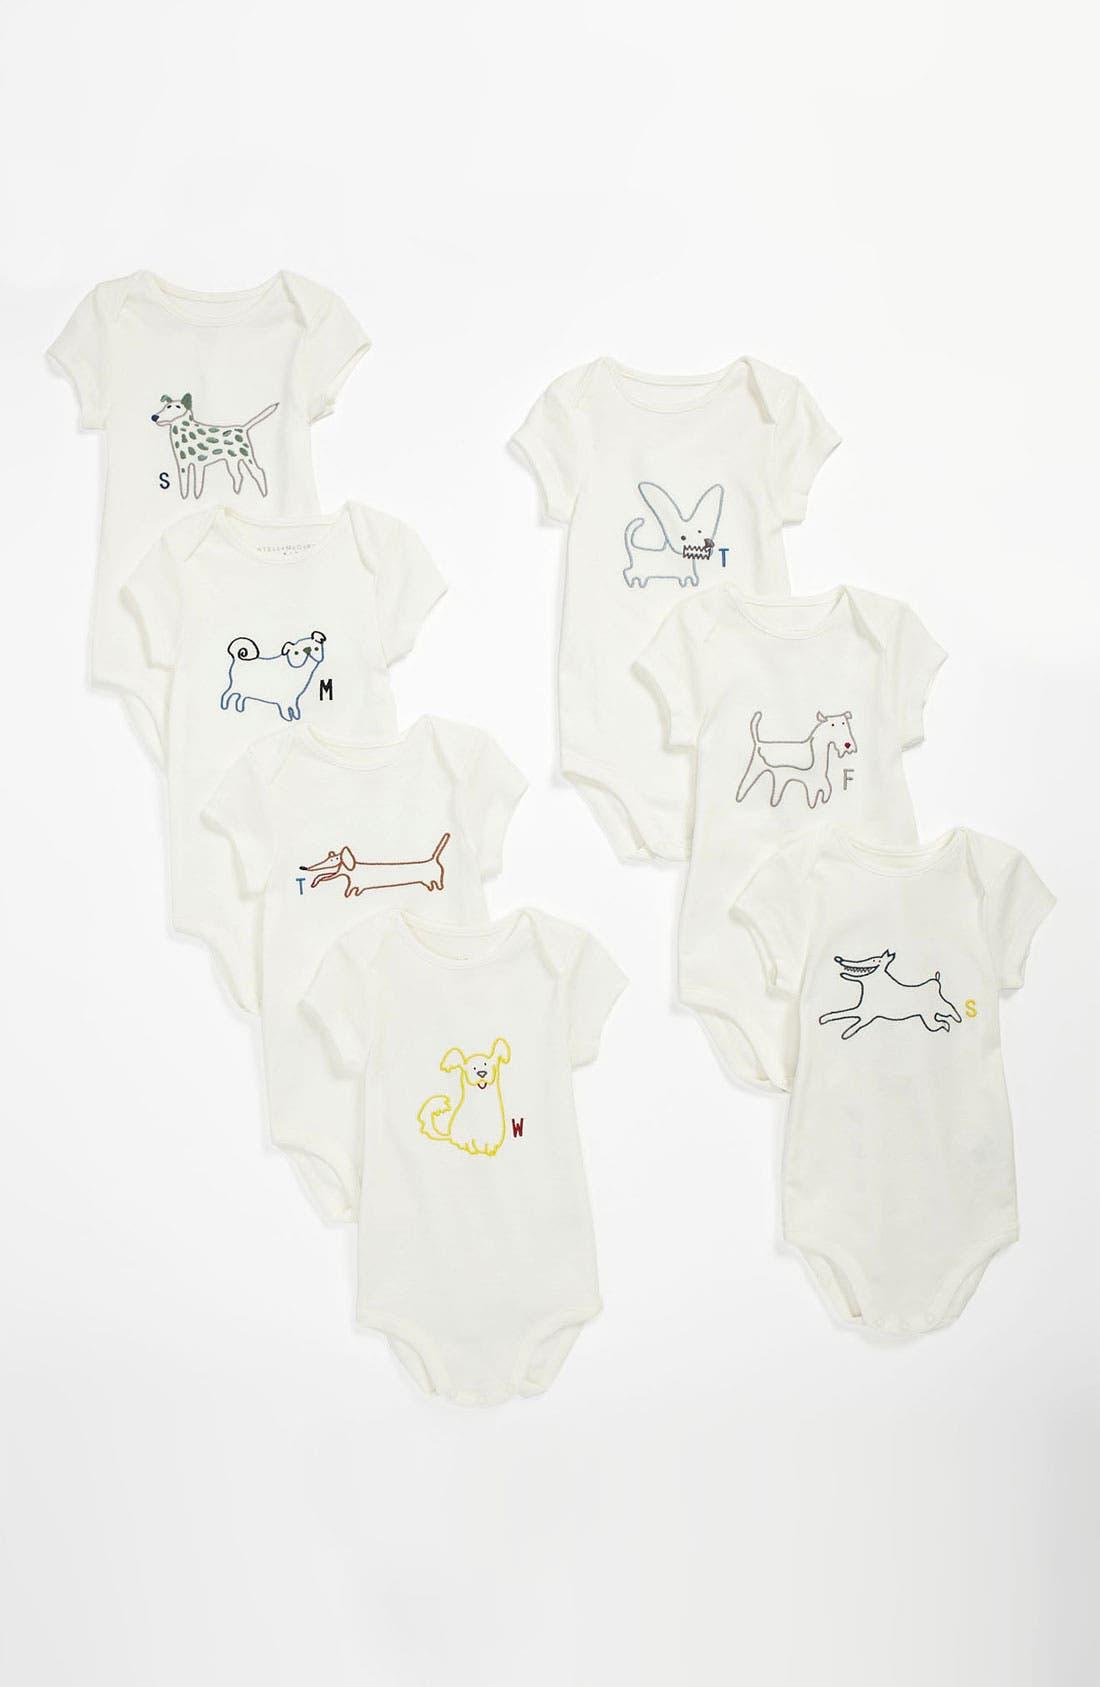 Alternate Image 1 Selected - Stella McCartney 'Sammie Baby' Bodysuit (Set of 7) (Infant)